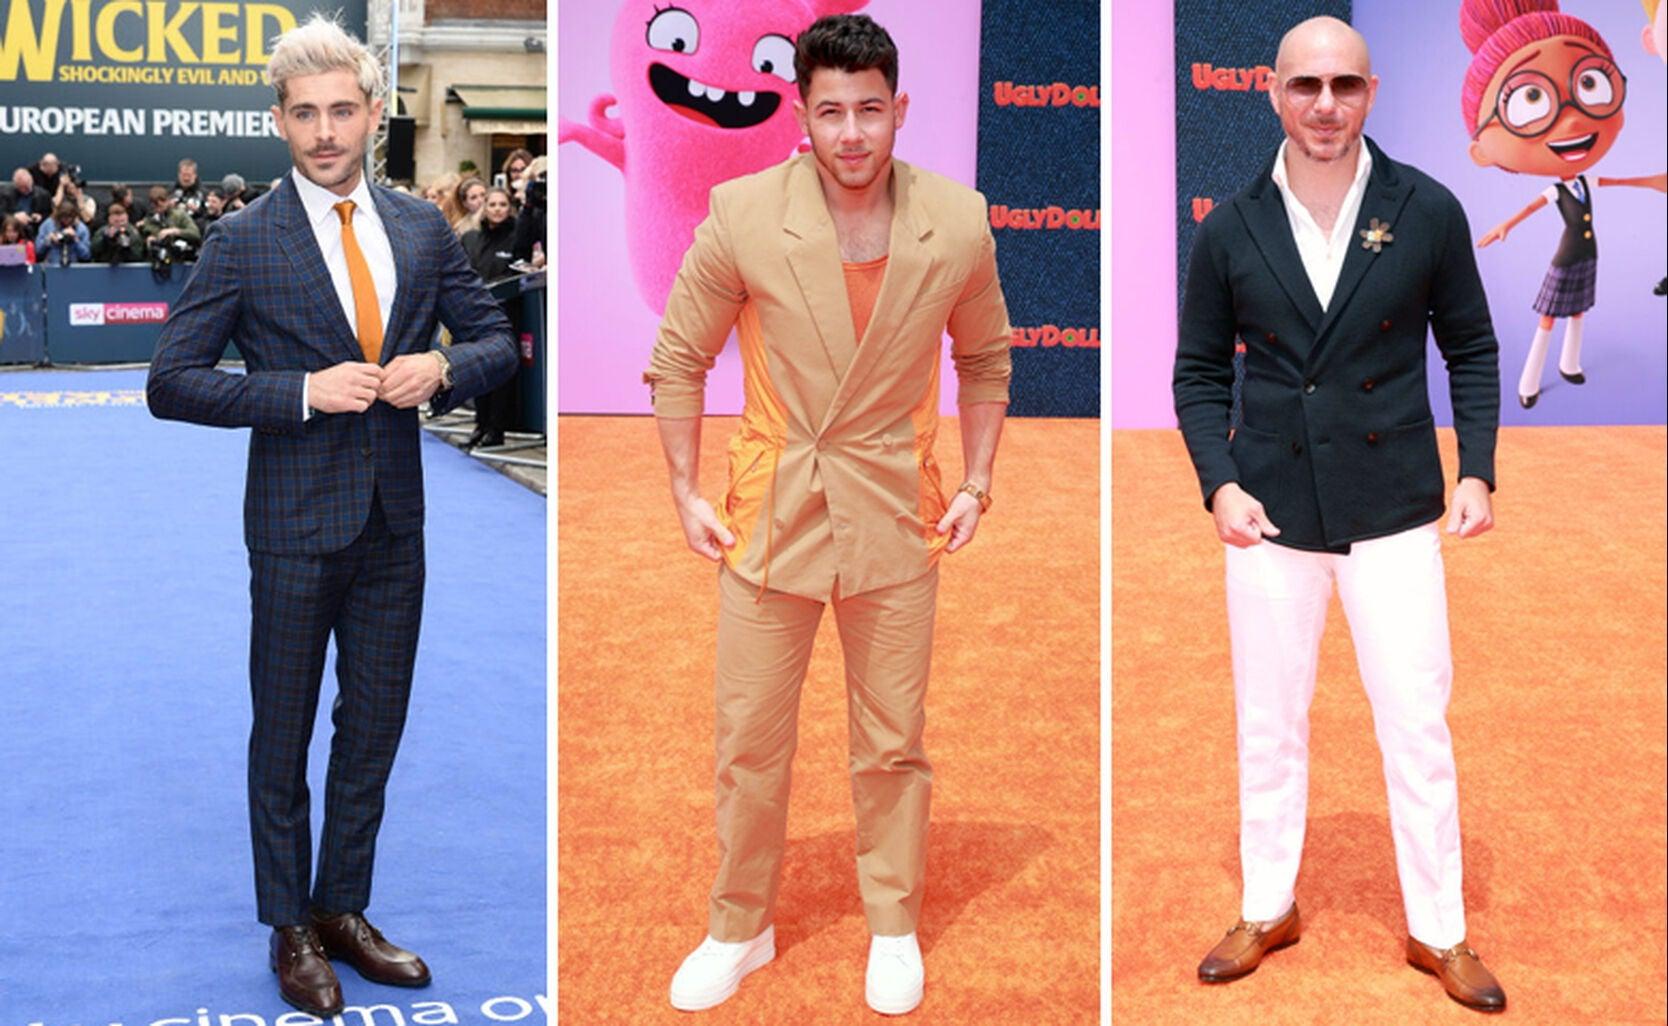 Zac Efron, Nick Jonas, Pitbull